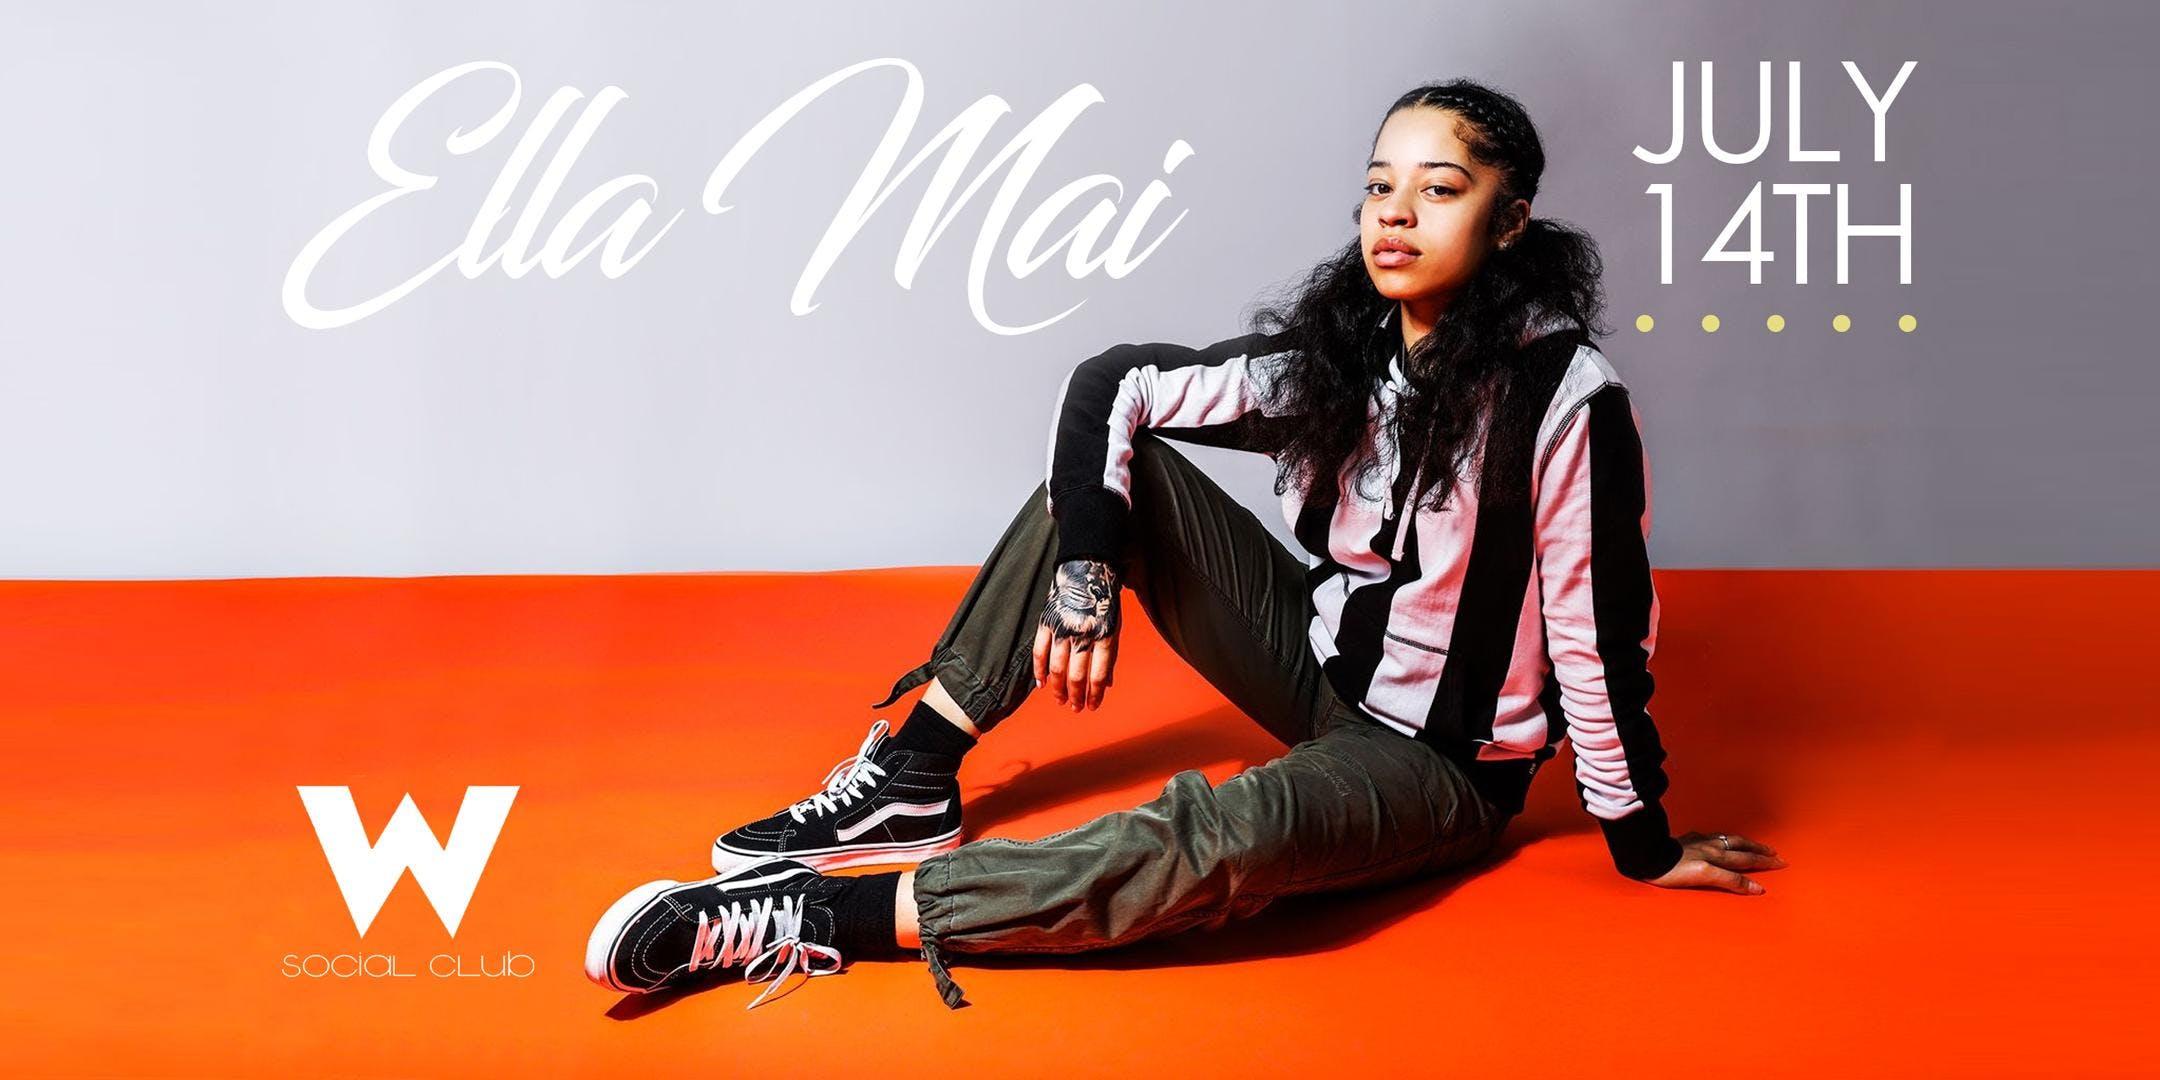 Breakout British RampB singersongwriter Ella Mai has announced her selftitled debut studio album Ella Mai arrives October 12 via 10 SummersInterscope Records and